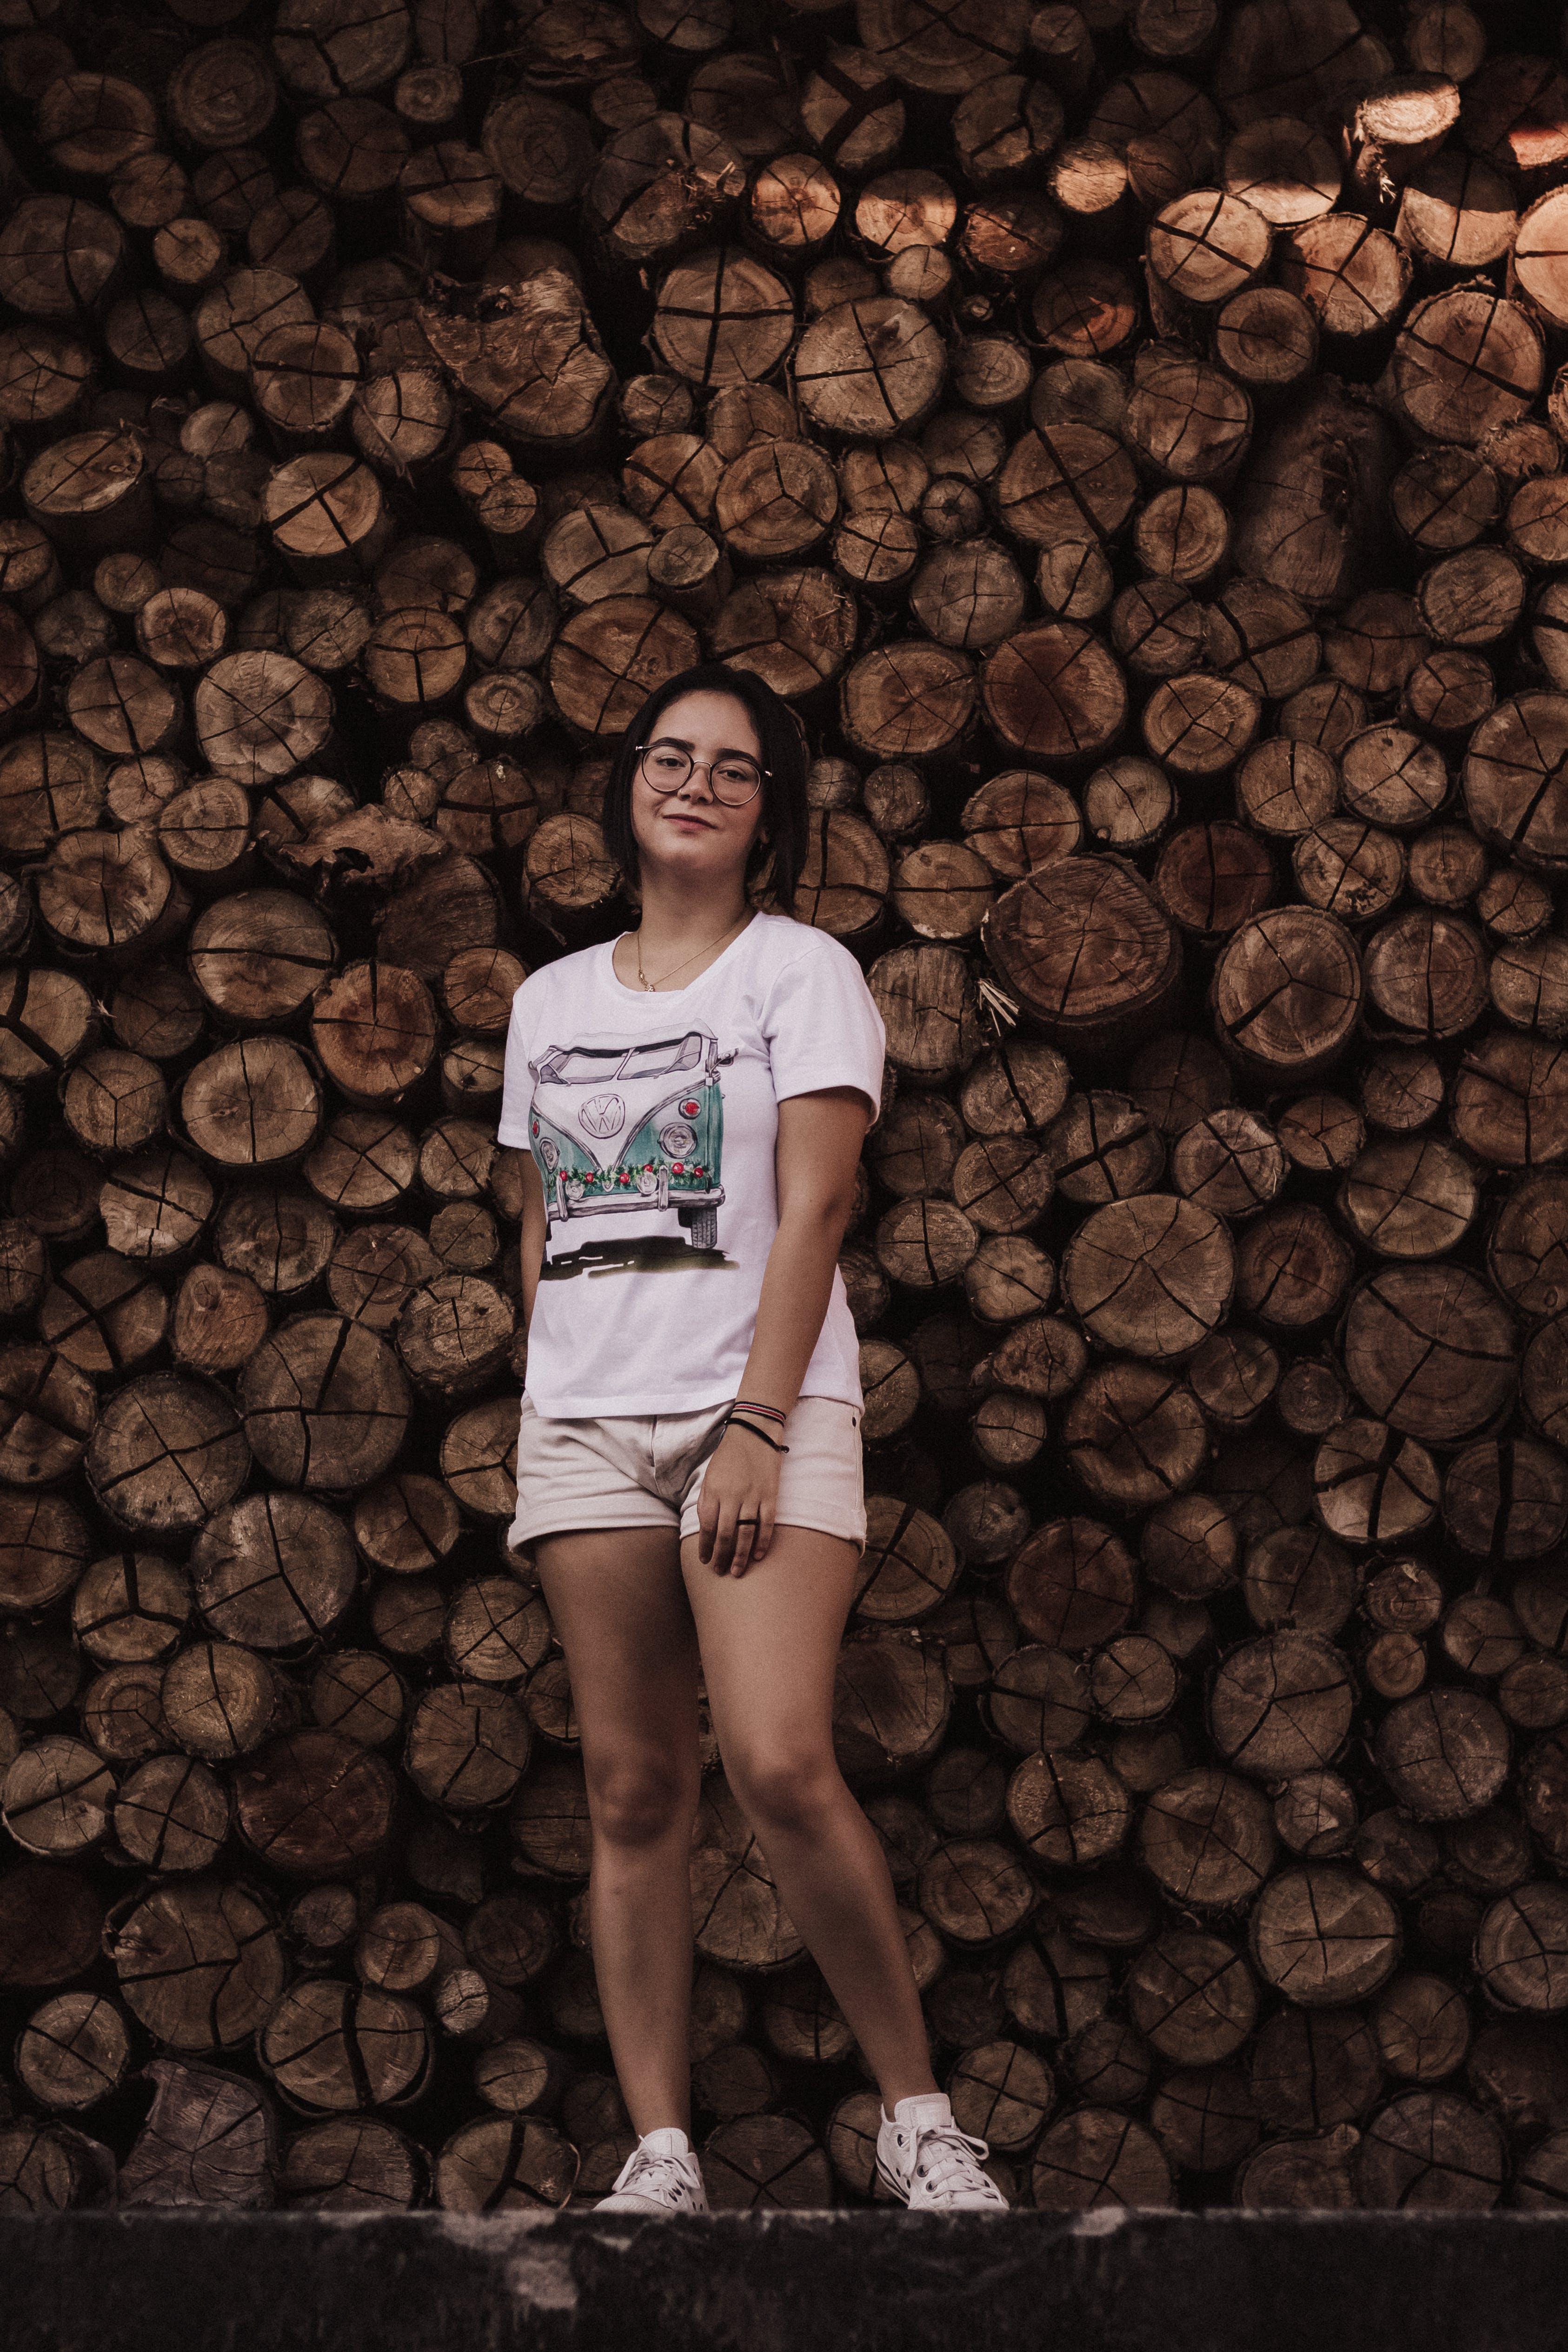 Fotos de stock gratuitas de dama